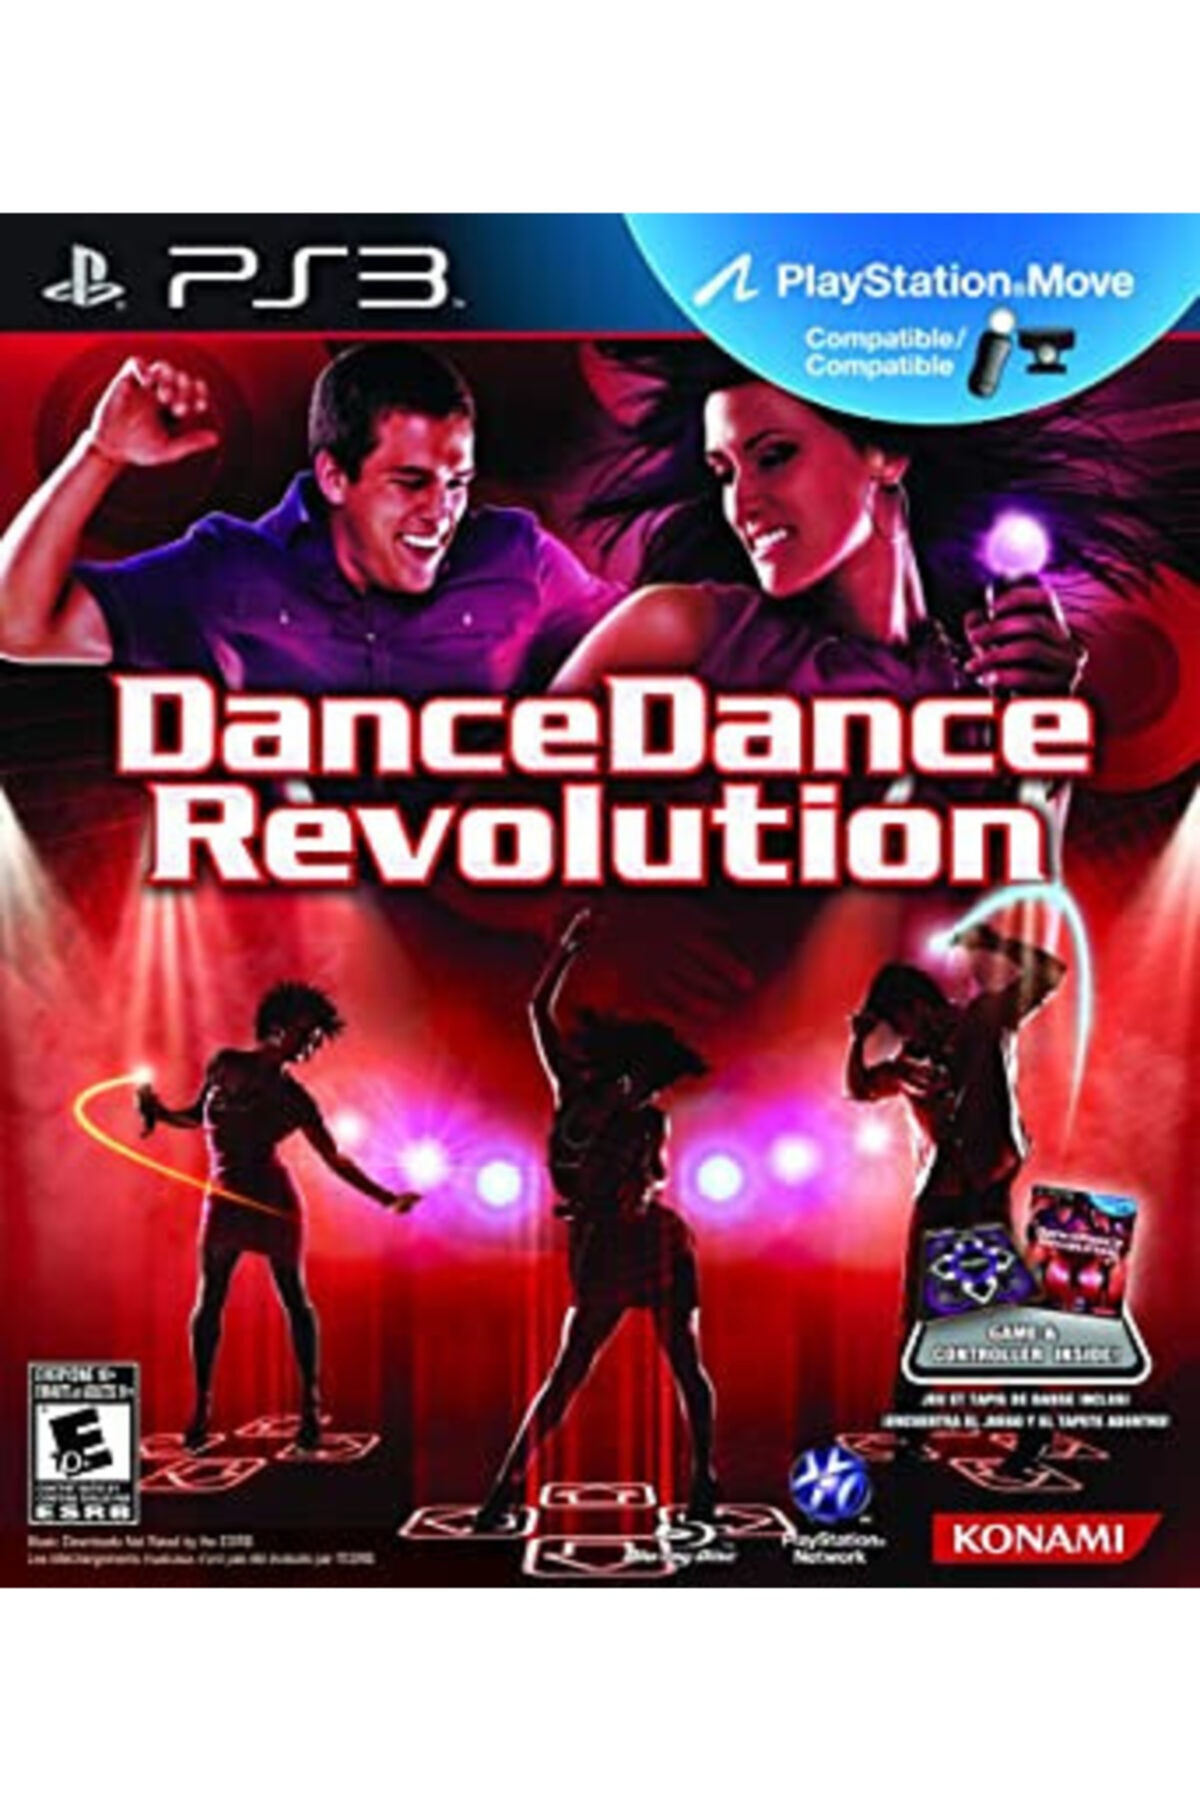 KONAMI Dancedance Revolution 1